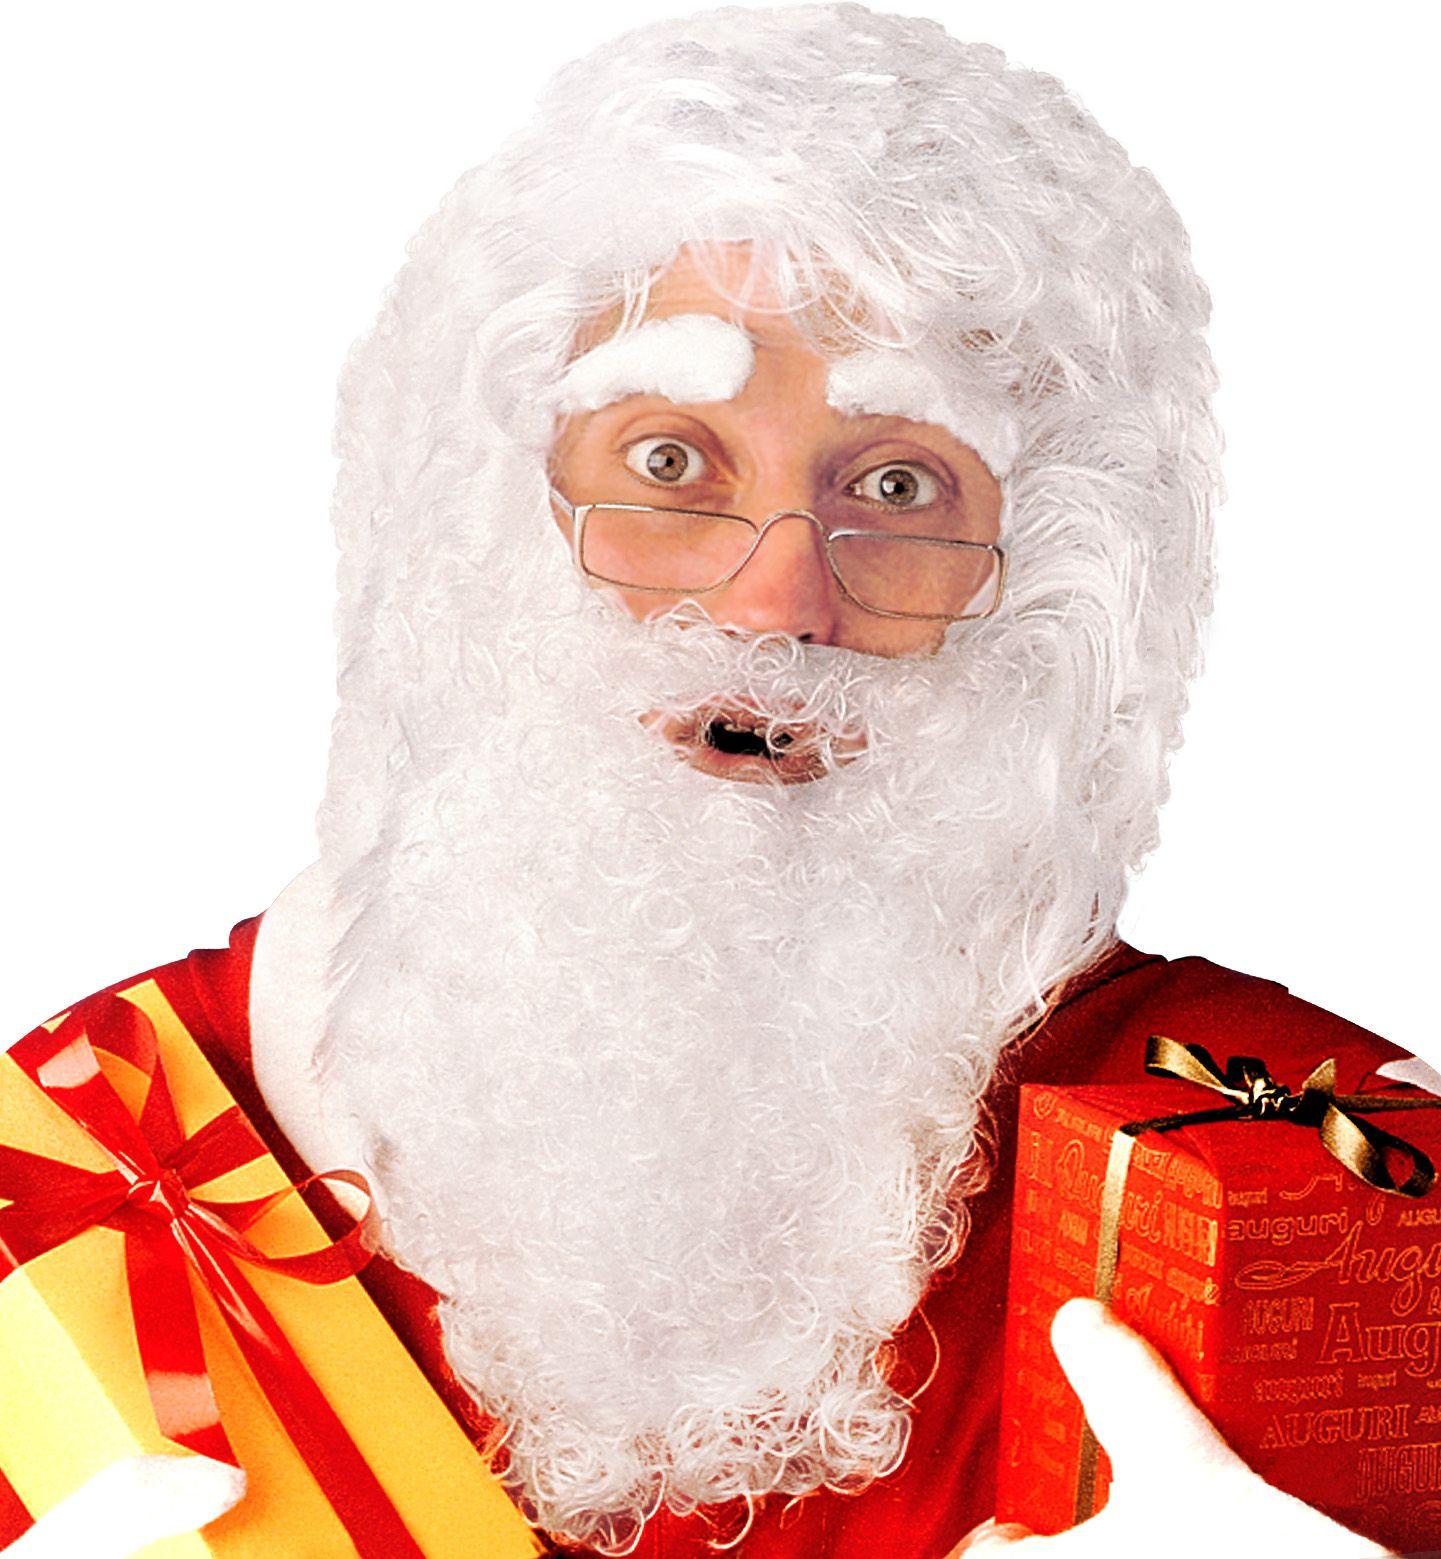 Witte kerstman pruik met baard, snor en wenkbrauwen